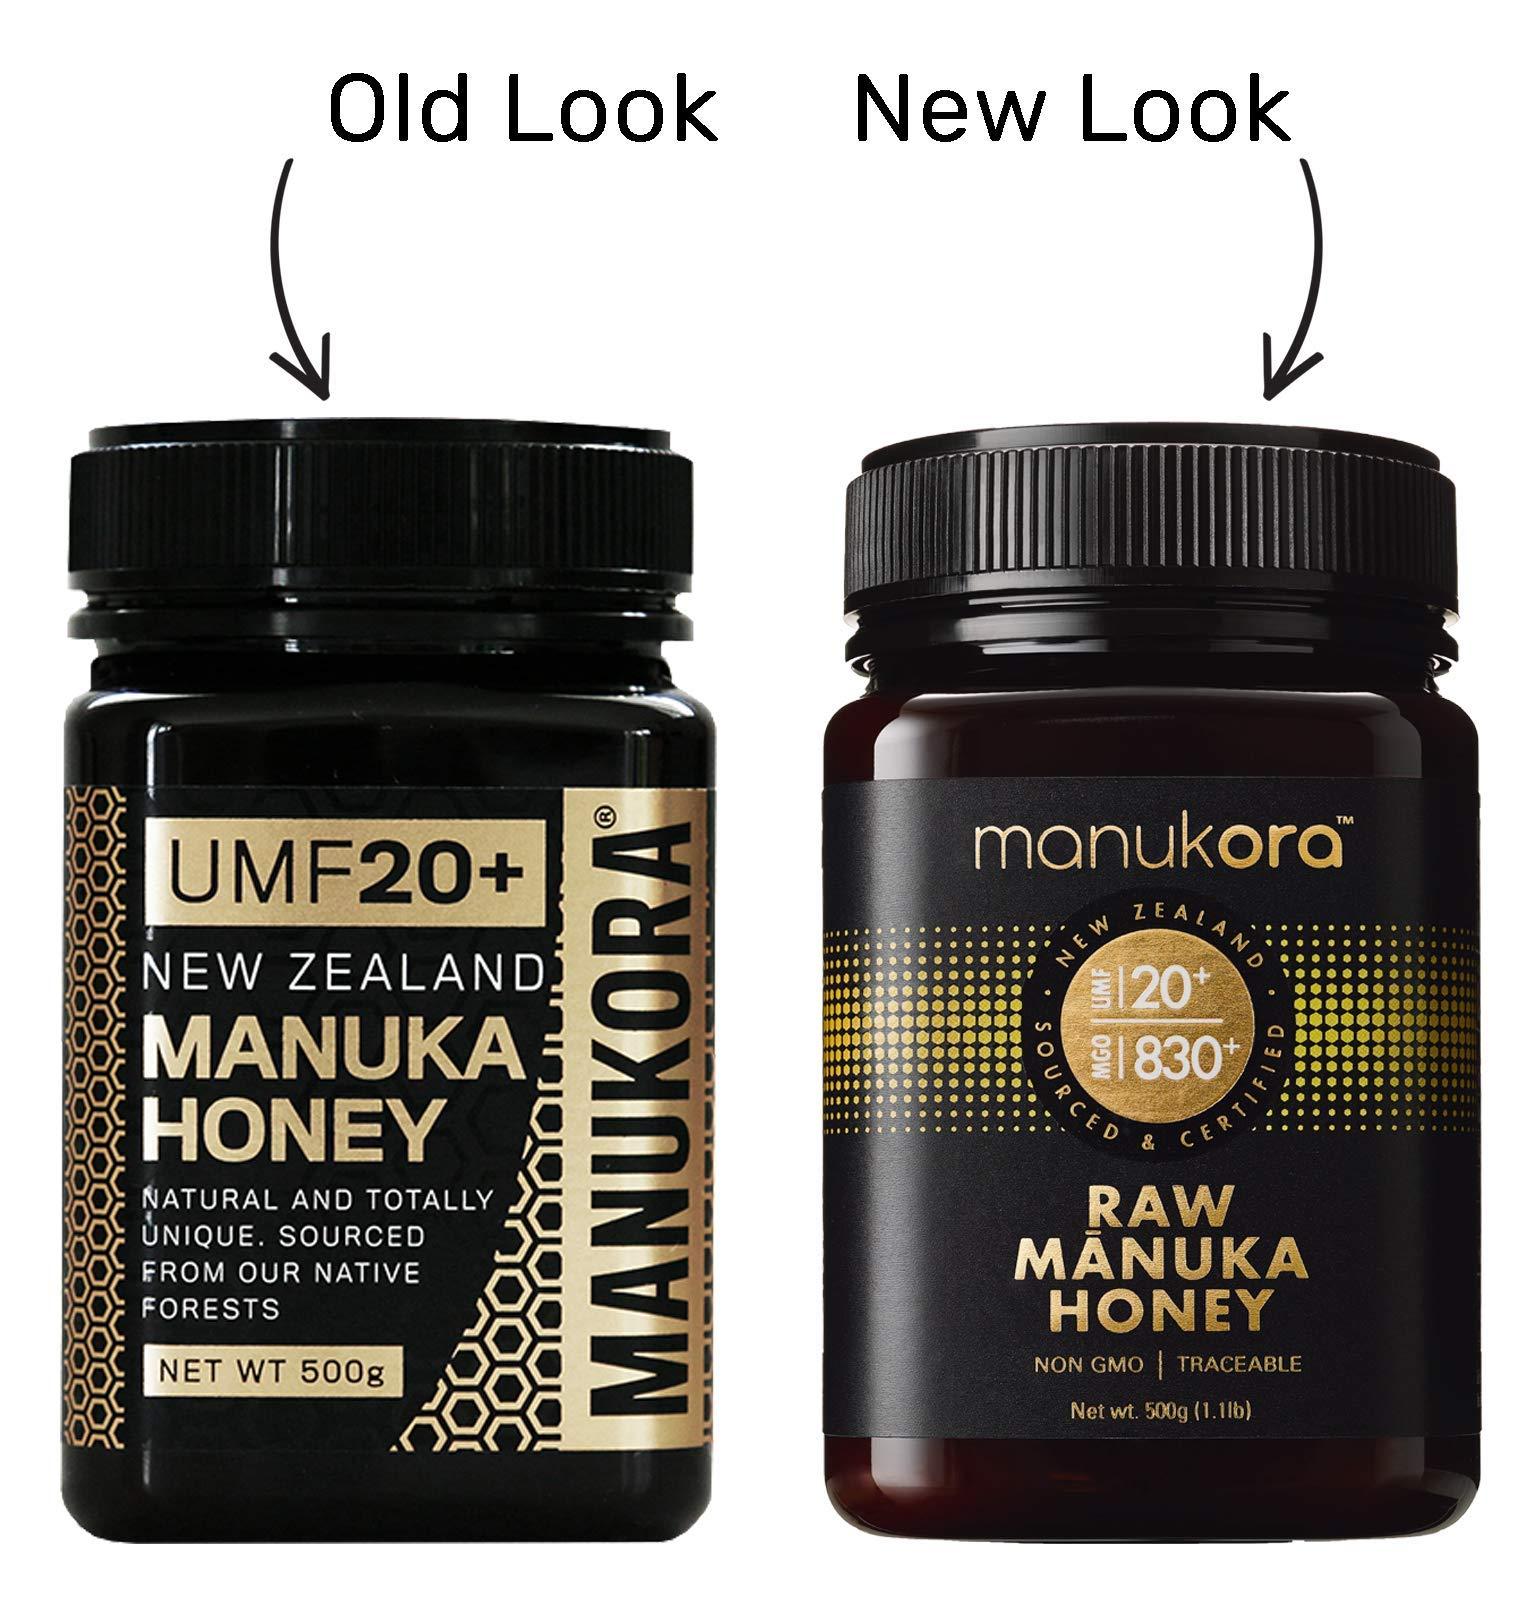 Manukora UMF 20+/MGO 830+ Raw Mānuka Honey (500g/1.1lb) Authentic Non-GMO New Zealand Honey, UMF & MGO Certified, Traceable from Hive to Hand by Manukora (Image #7)